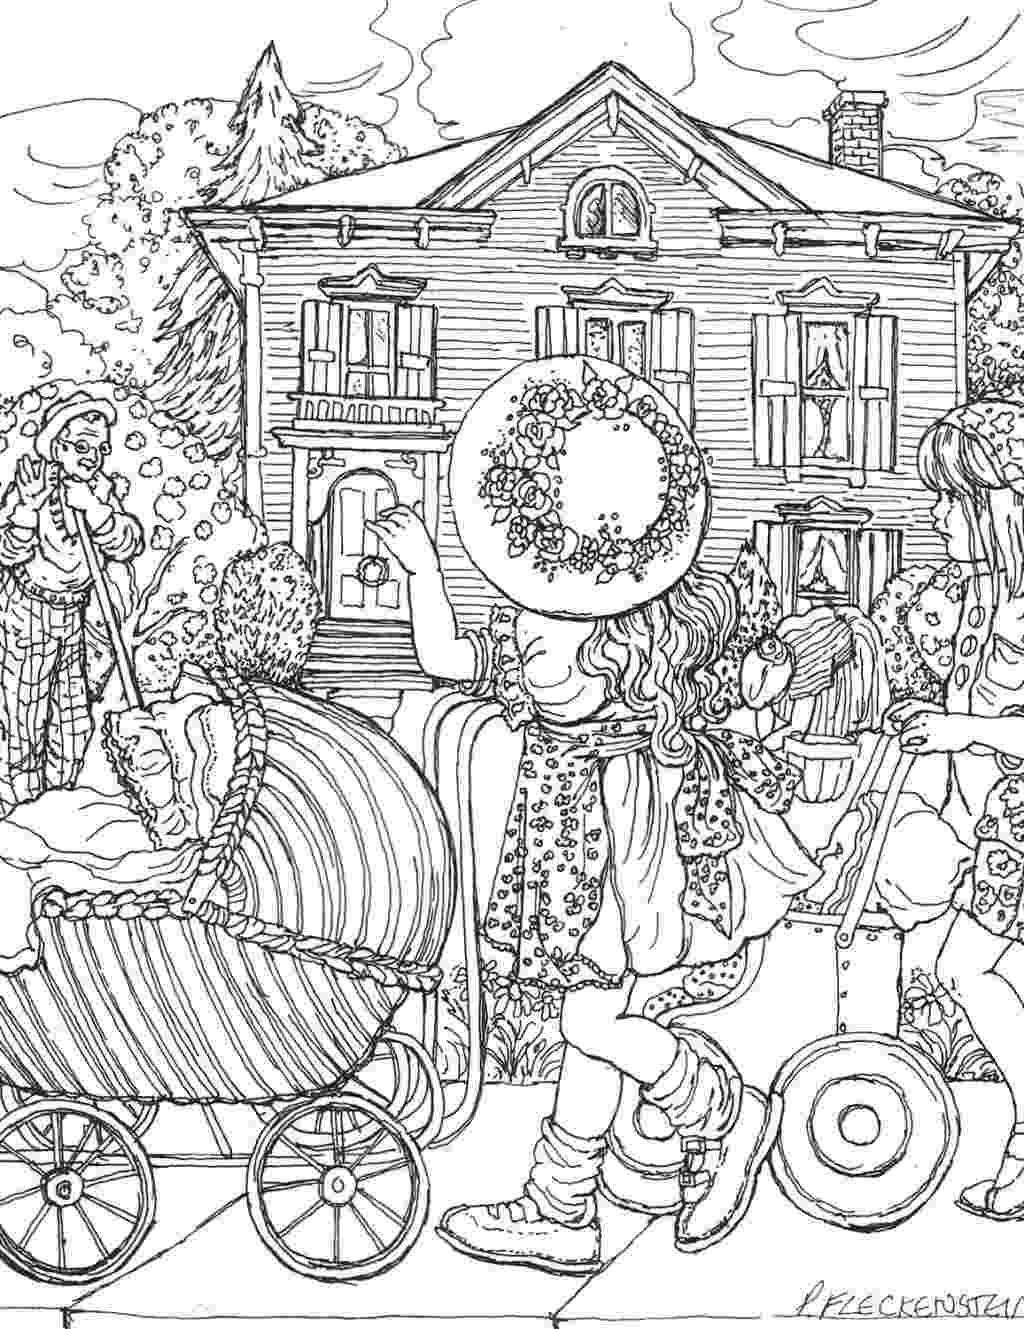 vybz kartel coloring book download hulk madaroad home facebook hulk book coloring vybz kartel download